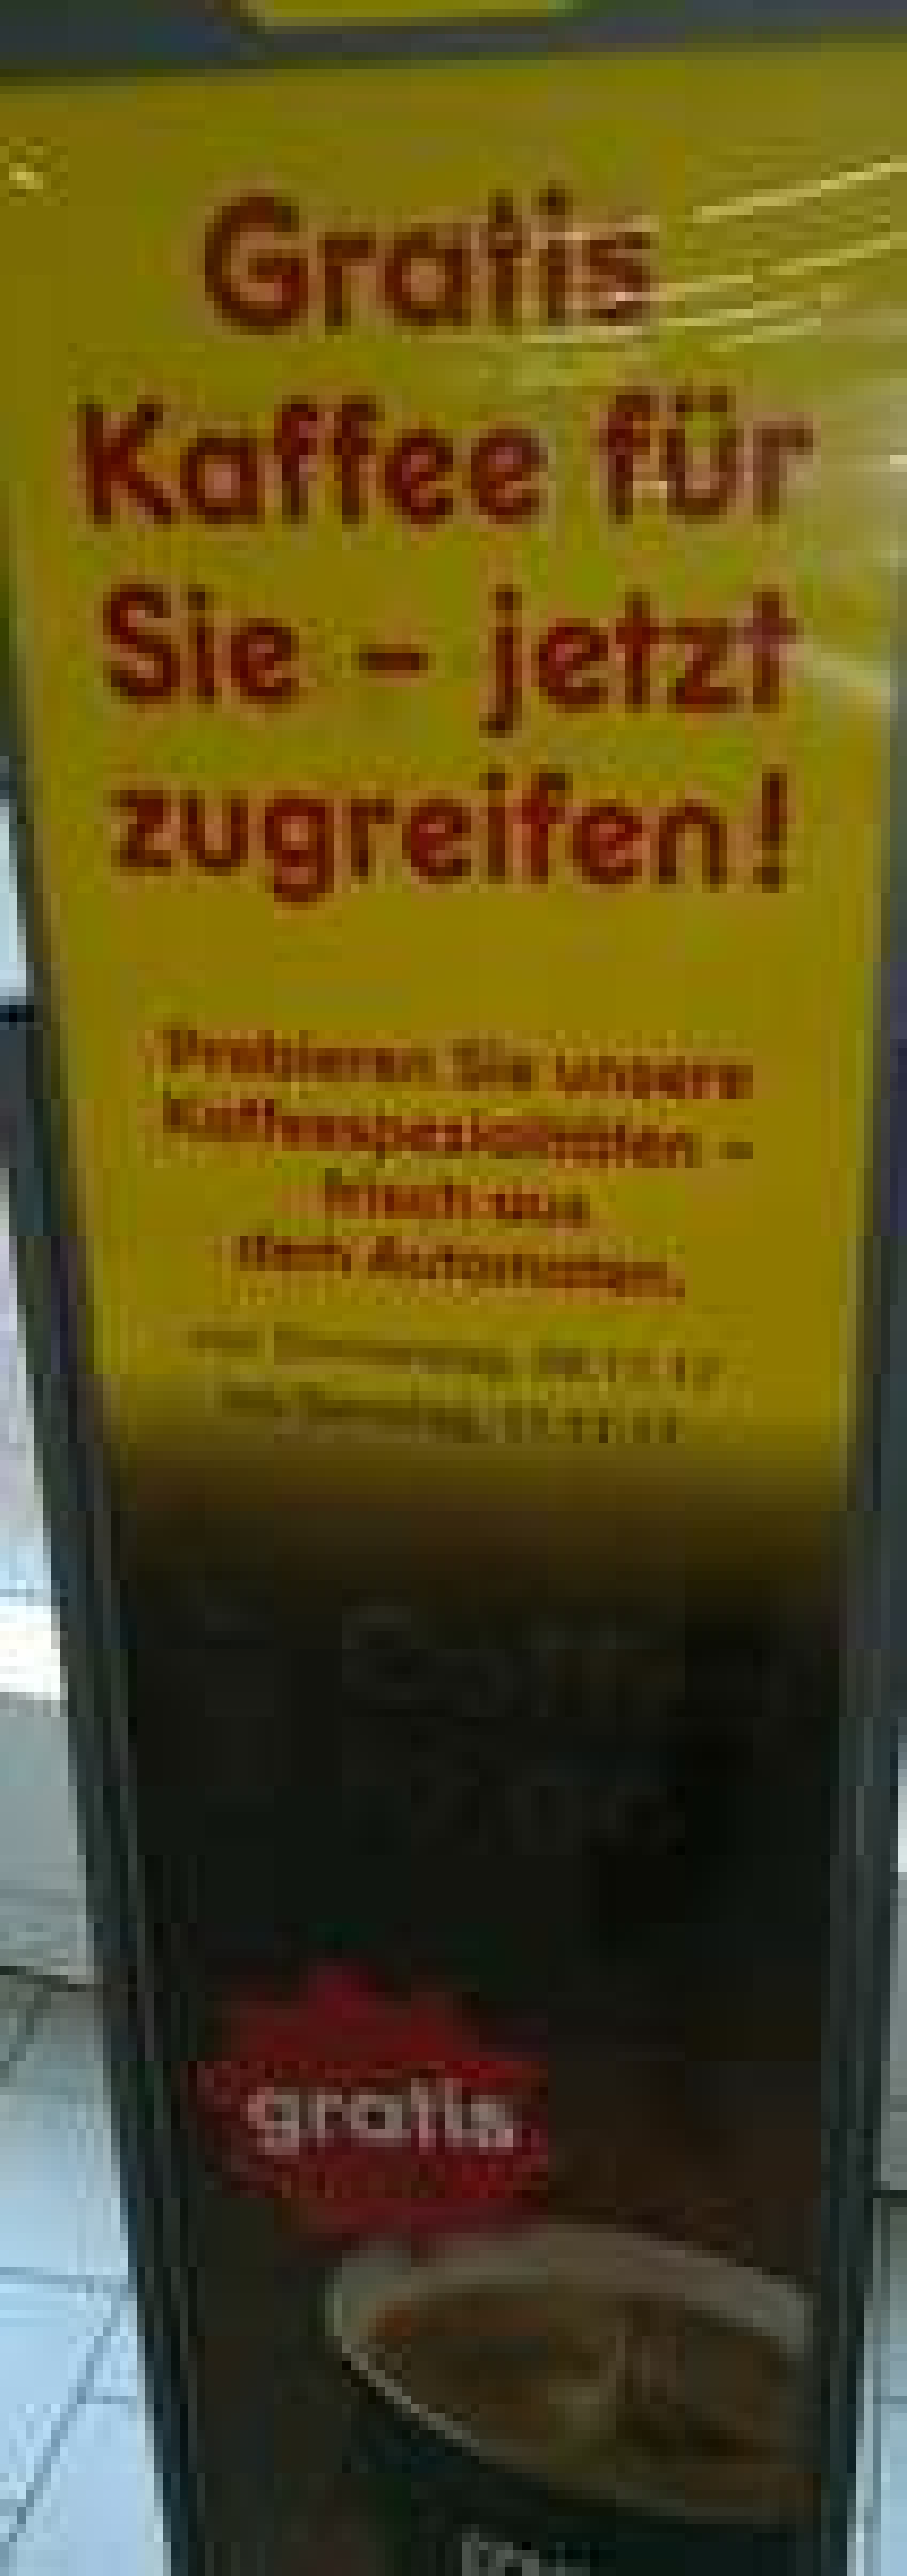 (Lokal Hamburg Altona) Gratis Kaffeespezialitäten z.Bsp. Latte Macchiato bei NETTO Große Bergstr.